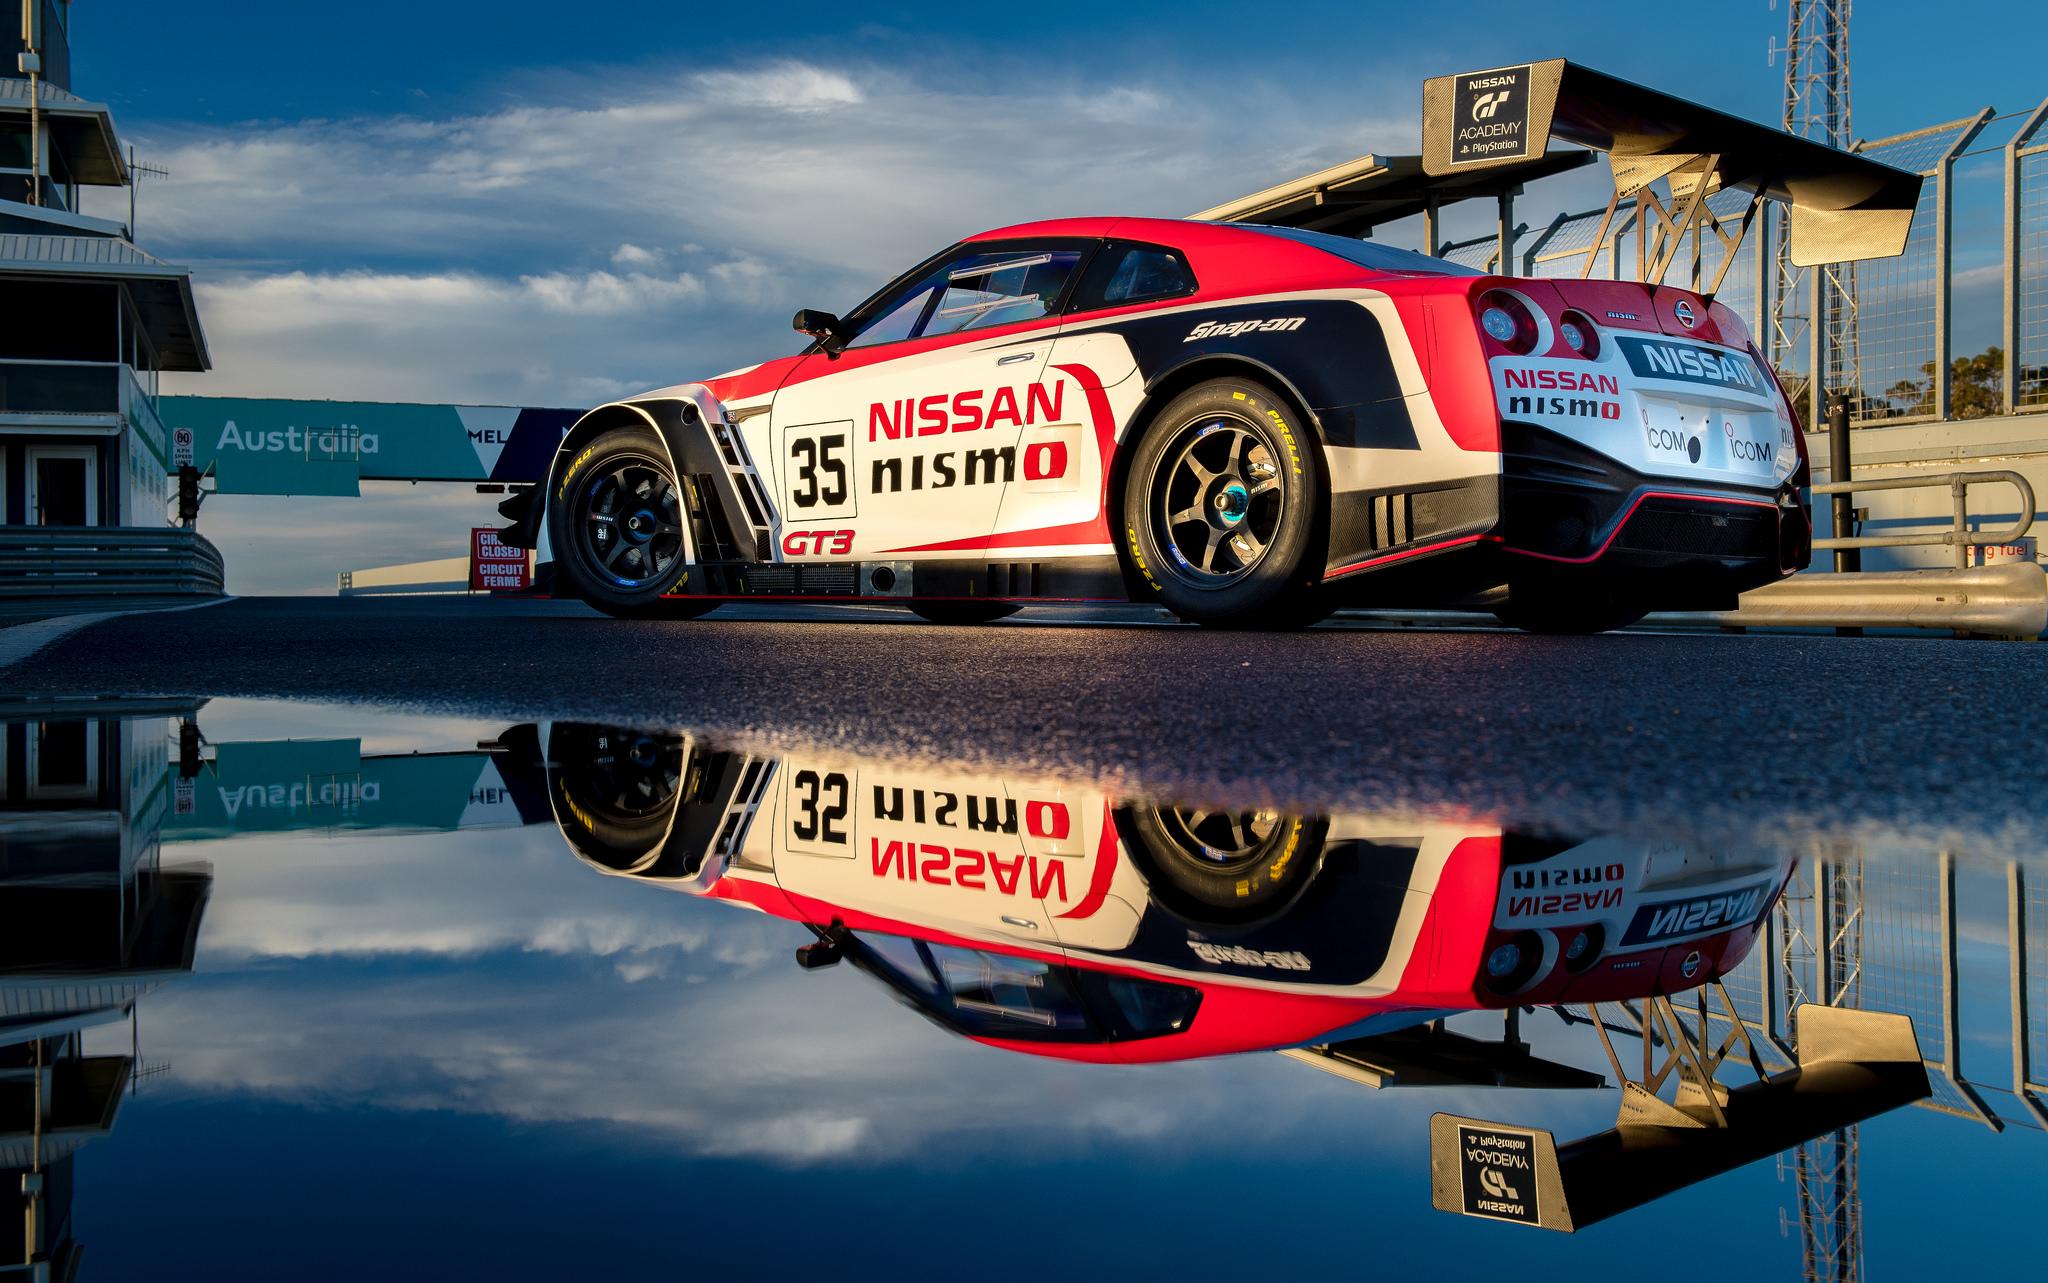 Nissan GT-R NISMO GT3 to make Australian GT Championship debut